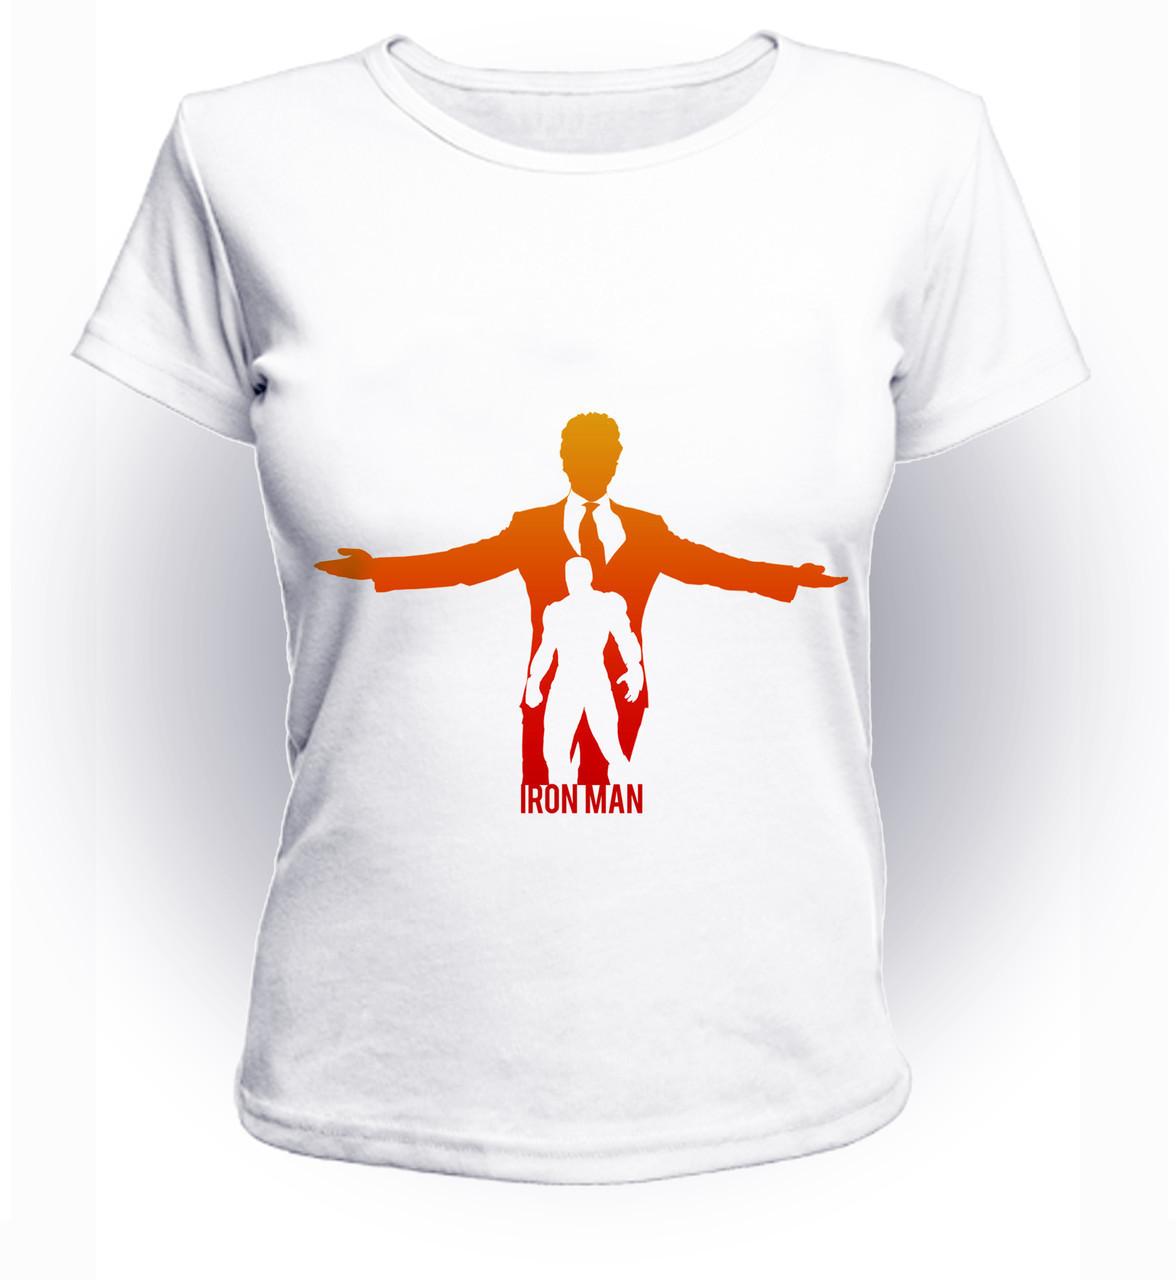 картинки футболка железный человека любовь